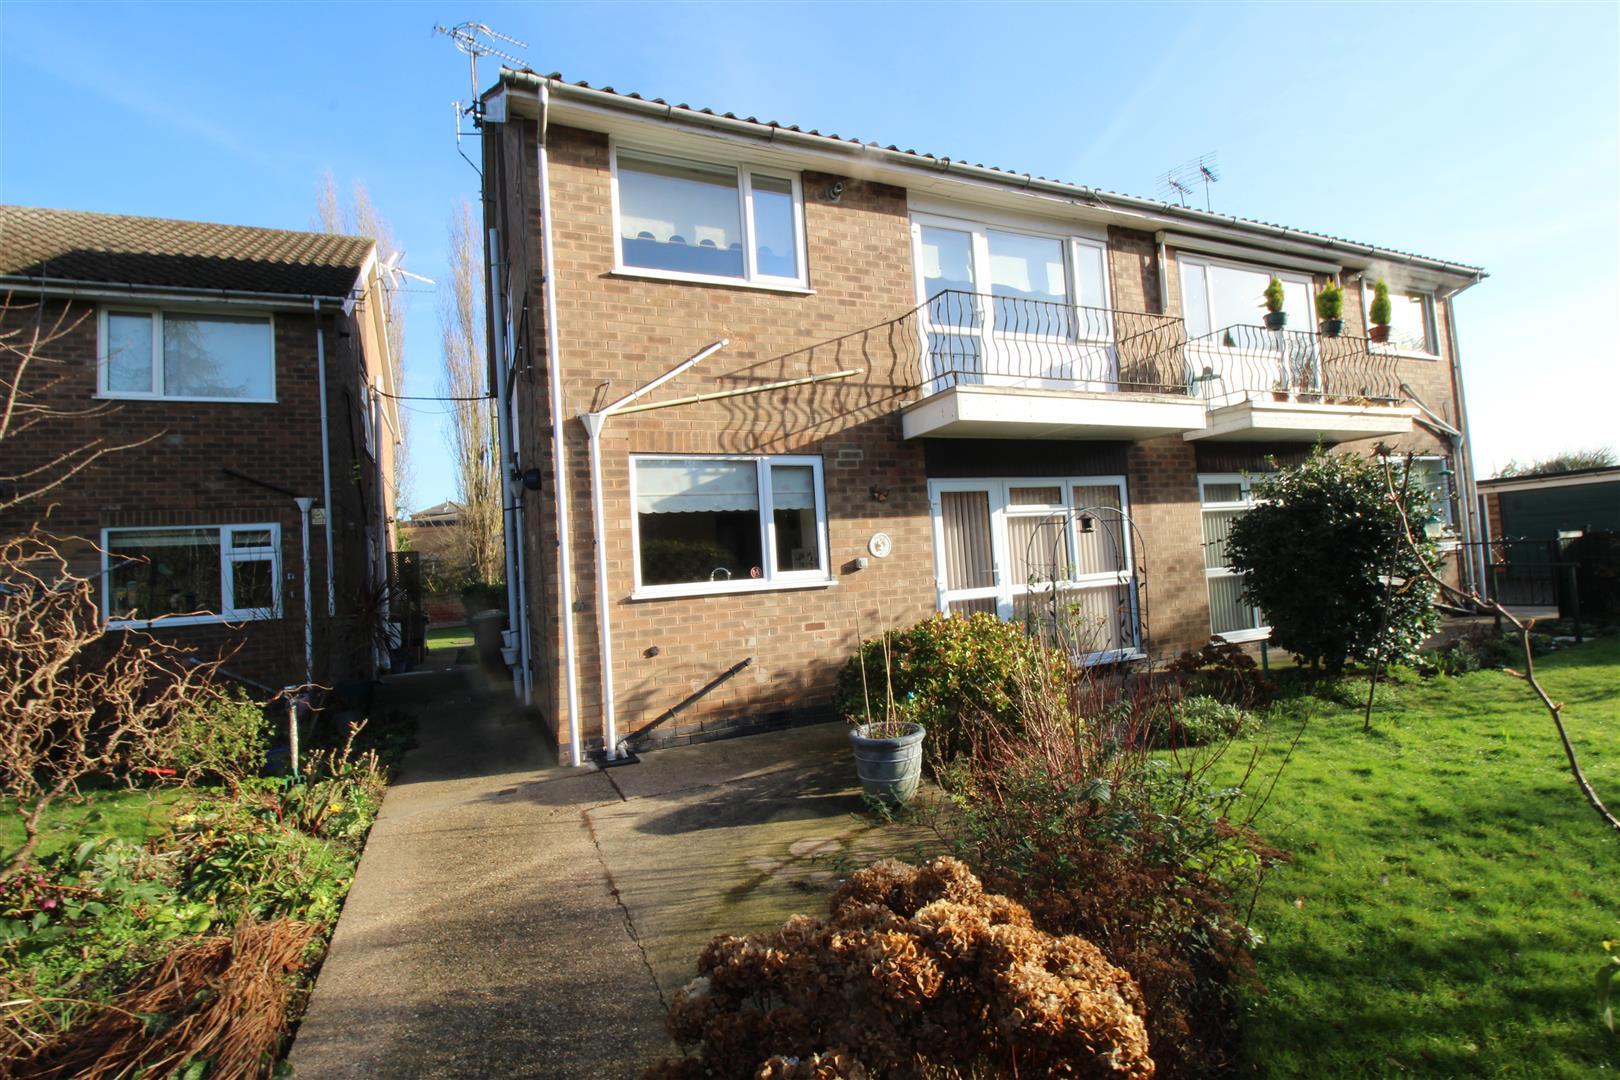 2 Bedrooms Flat for sale in Highfield Court, Beeston, Nottingham